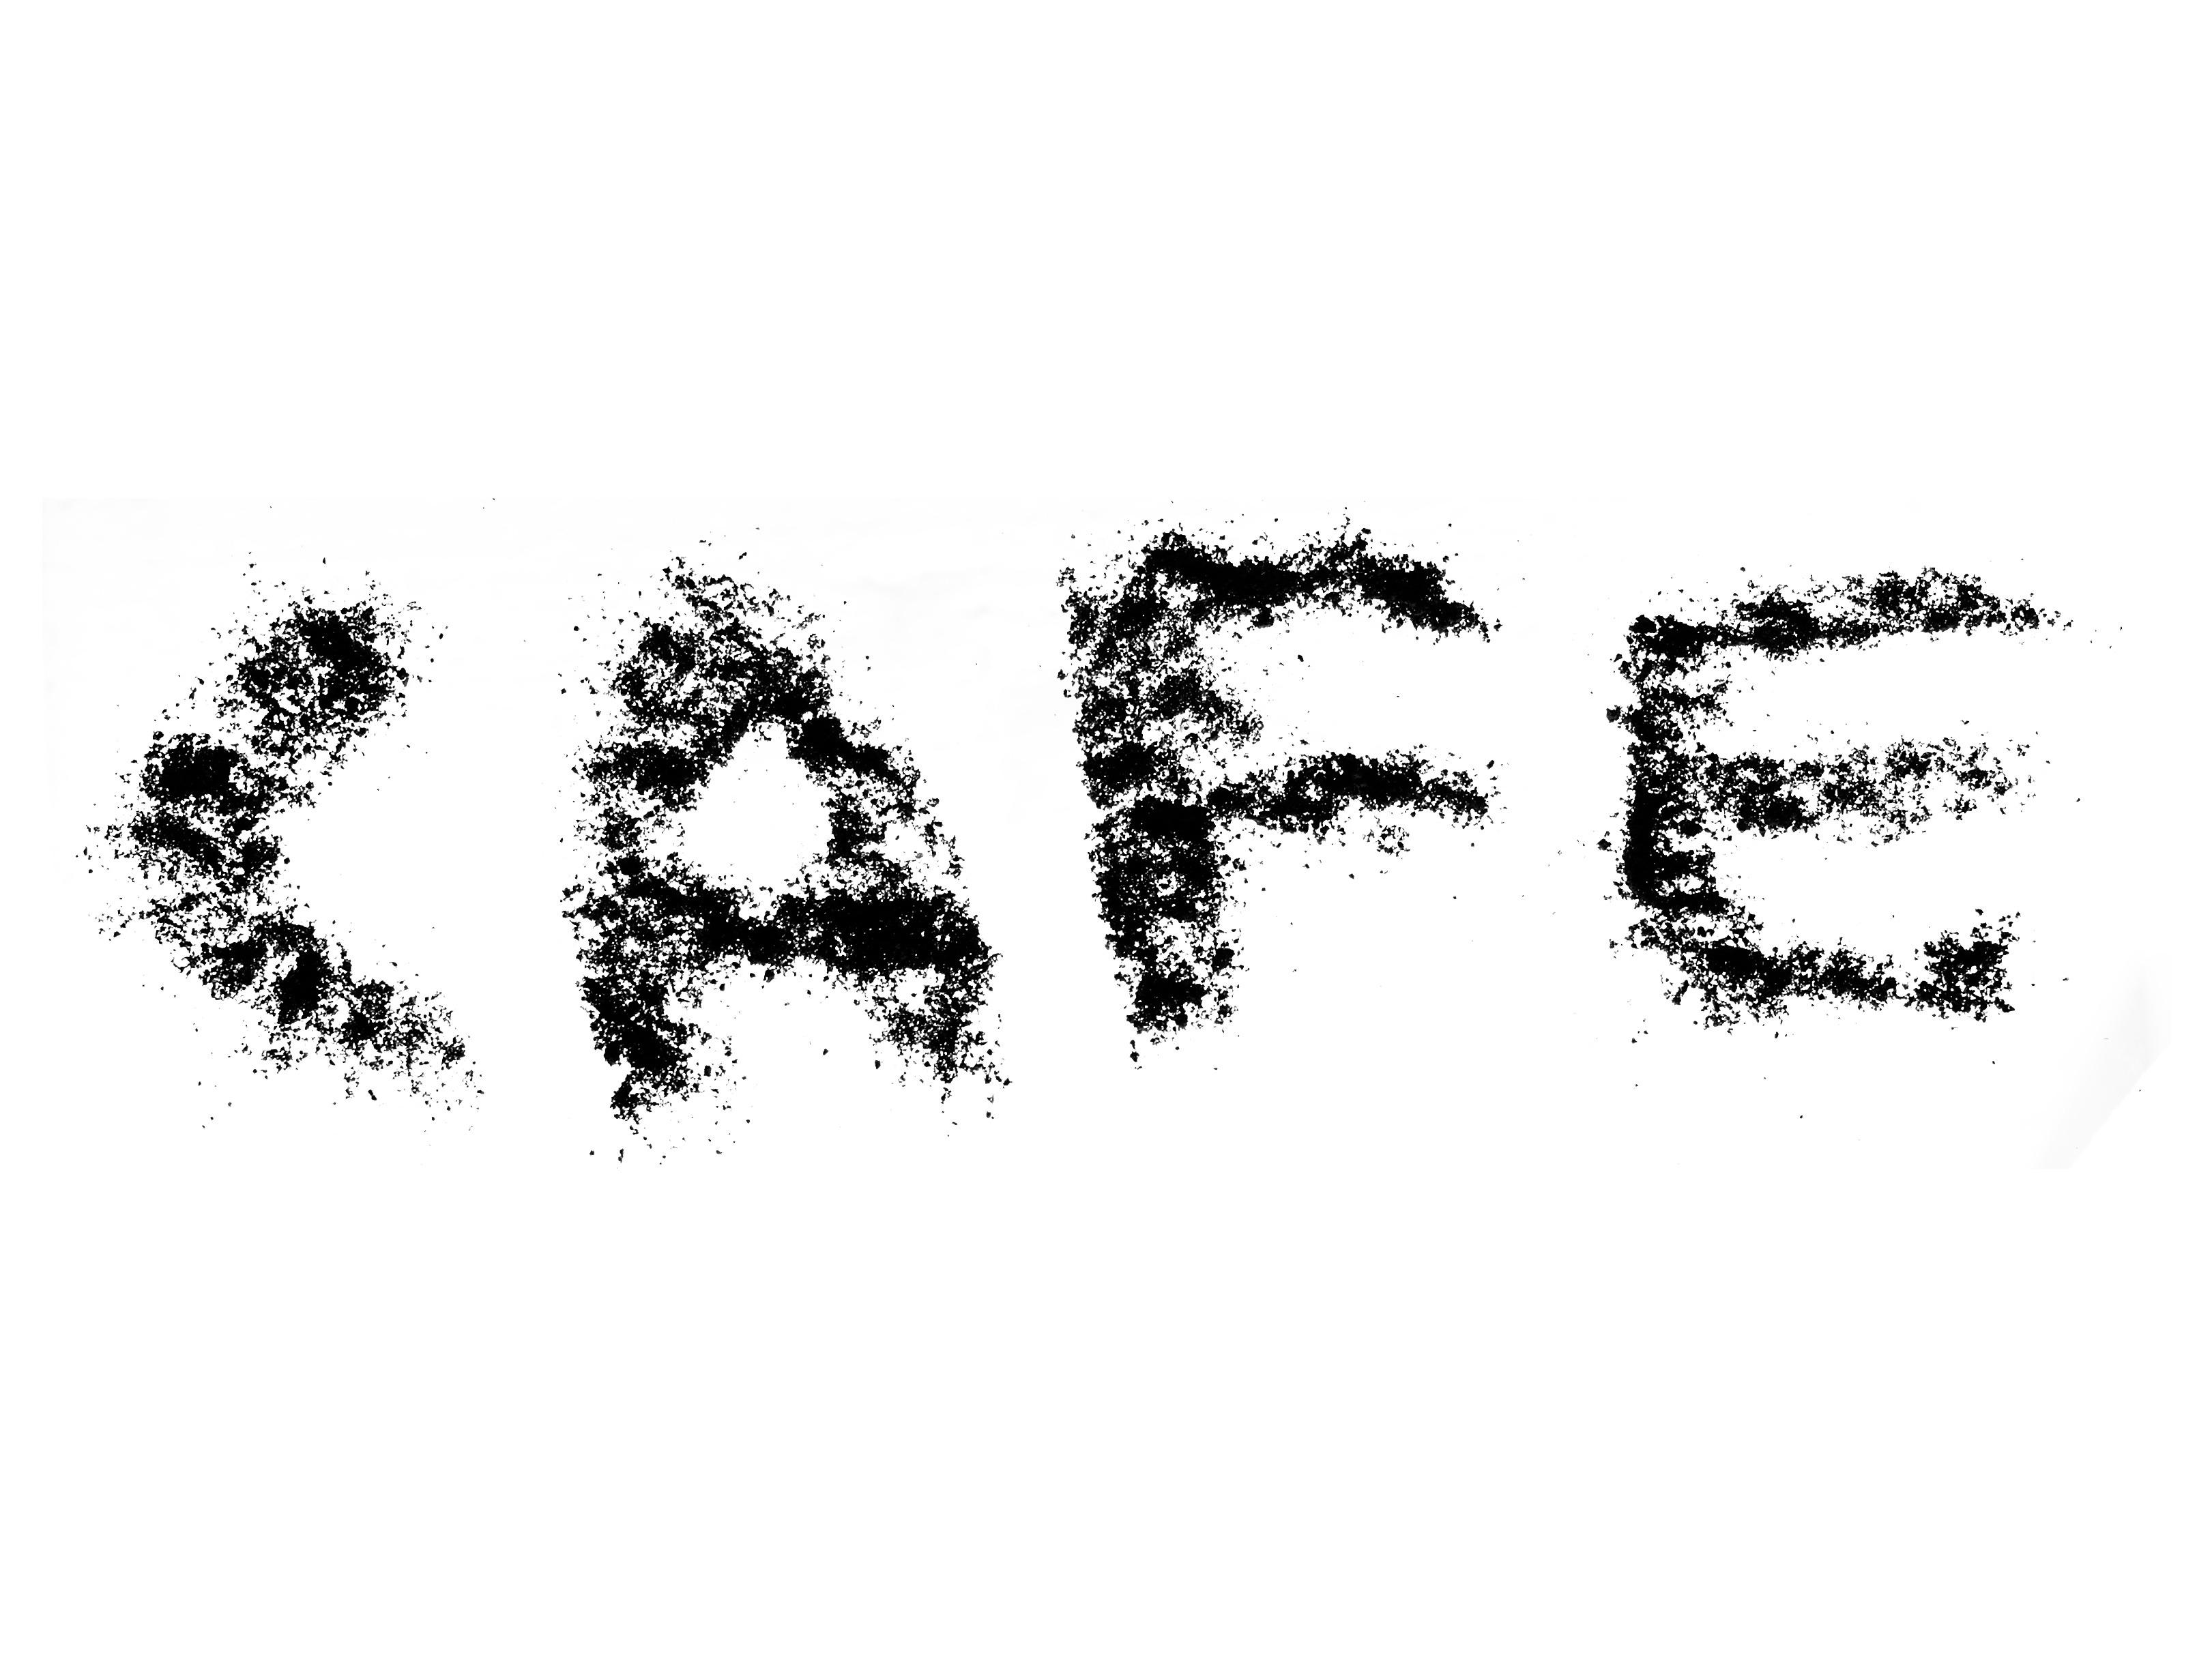 Gambar Bayangan Hitam Kafe Kopi Terpencil Fon Sketsa